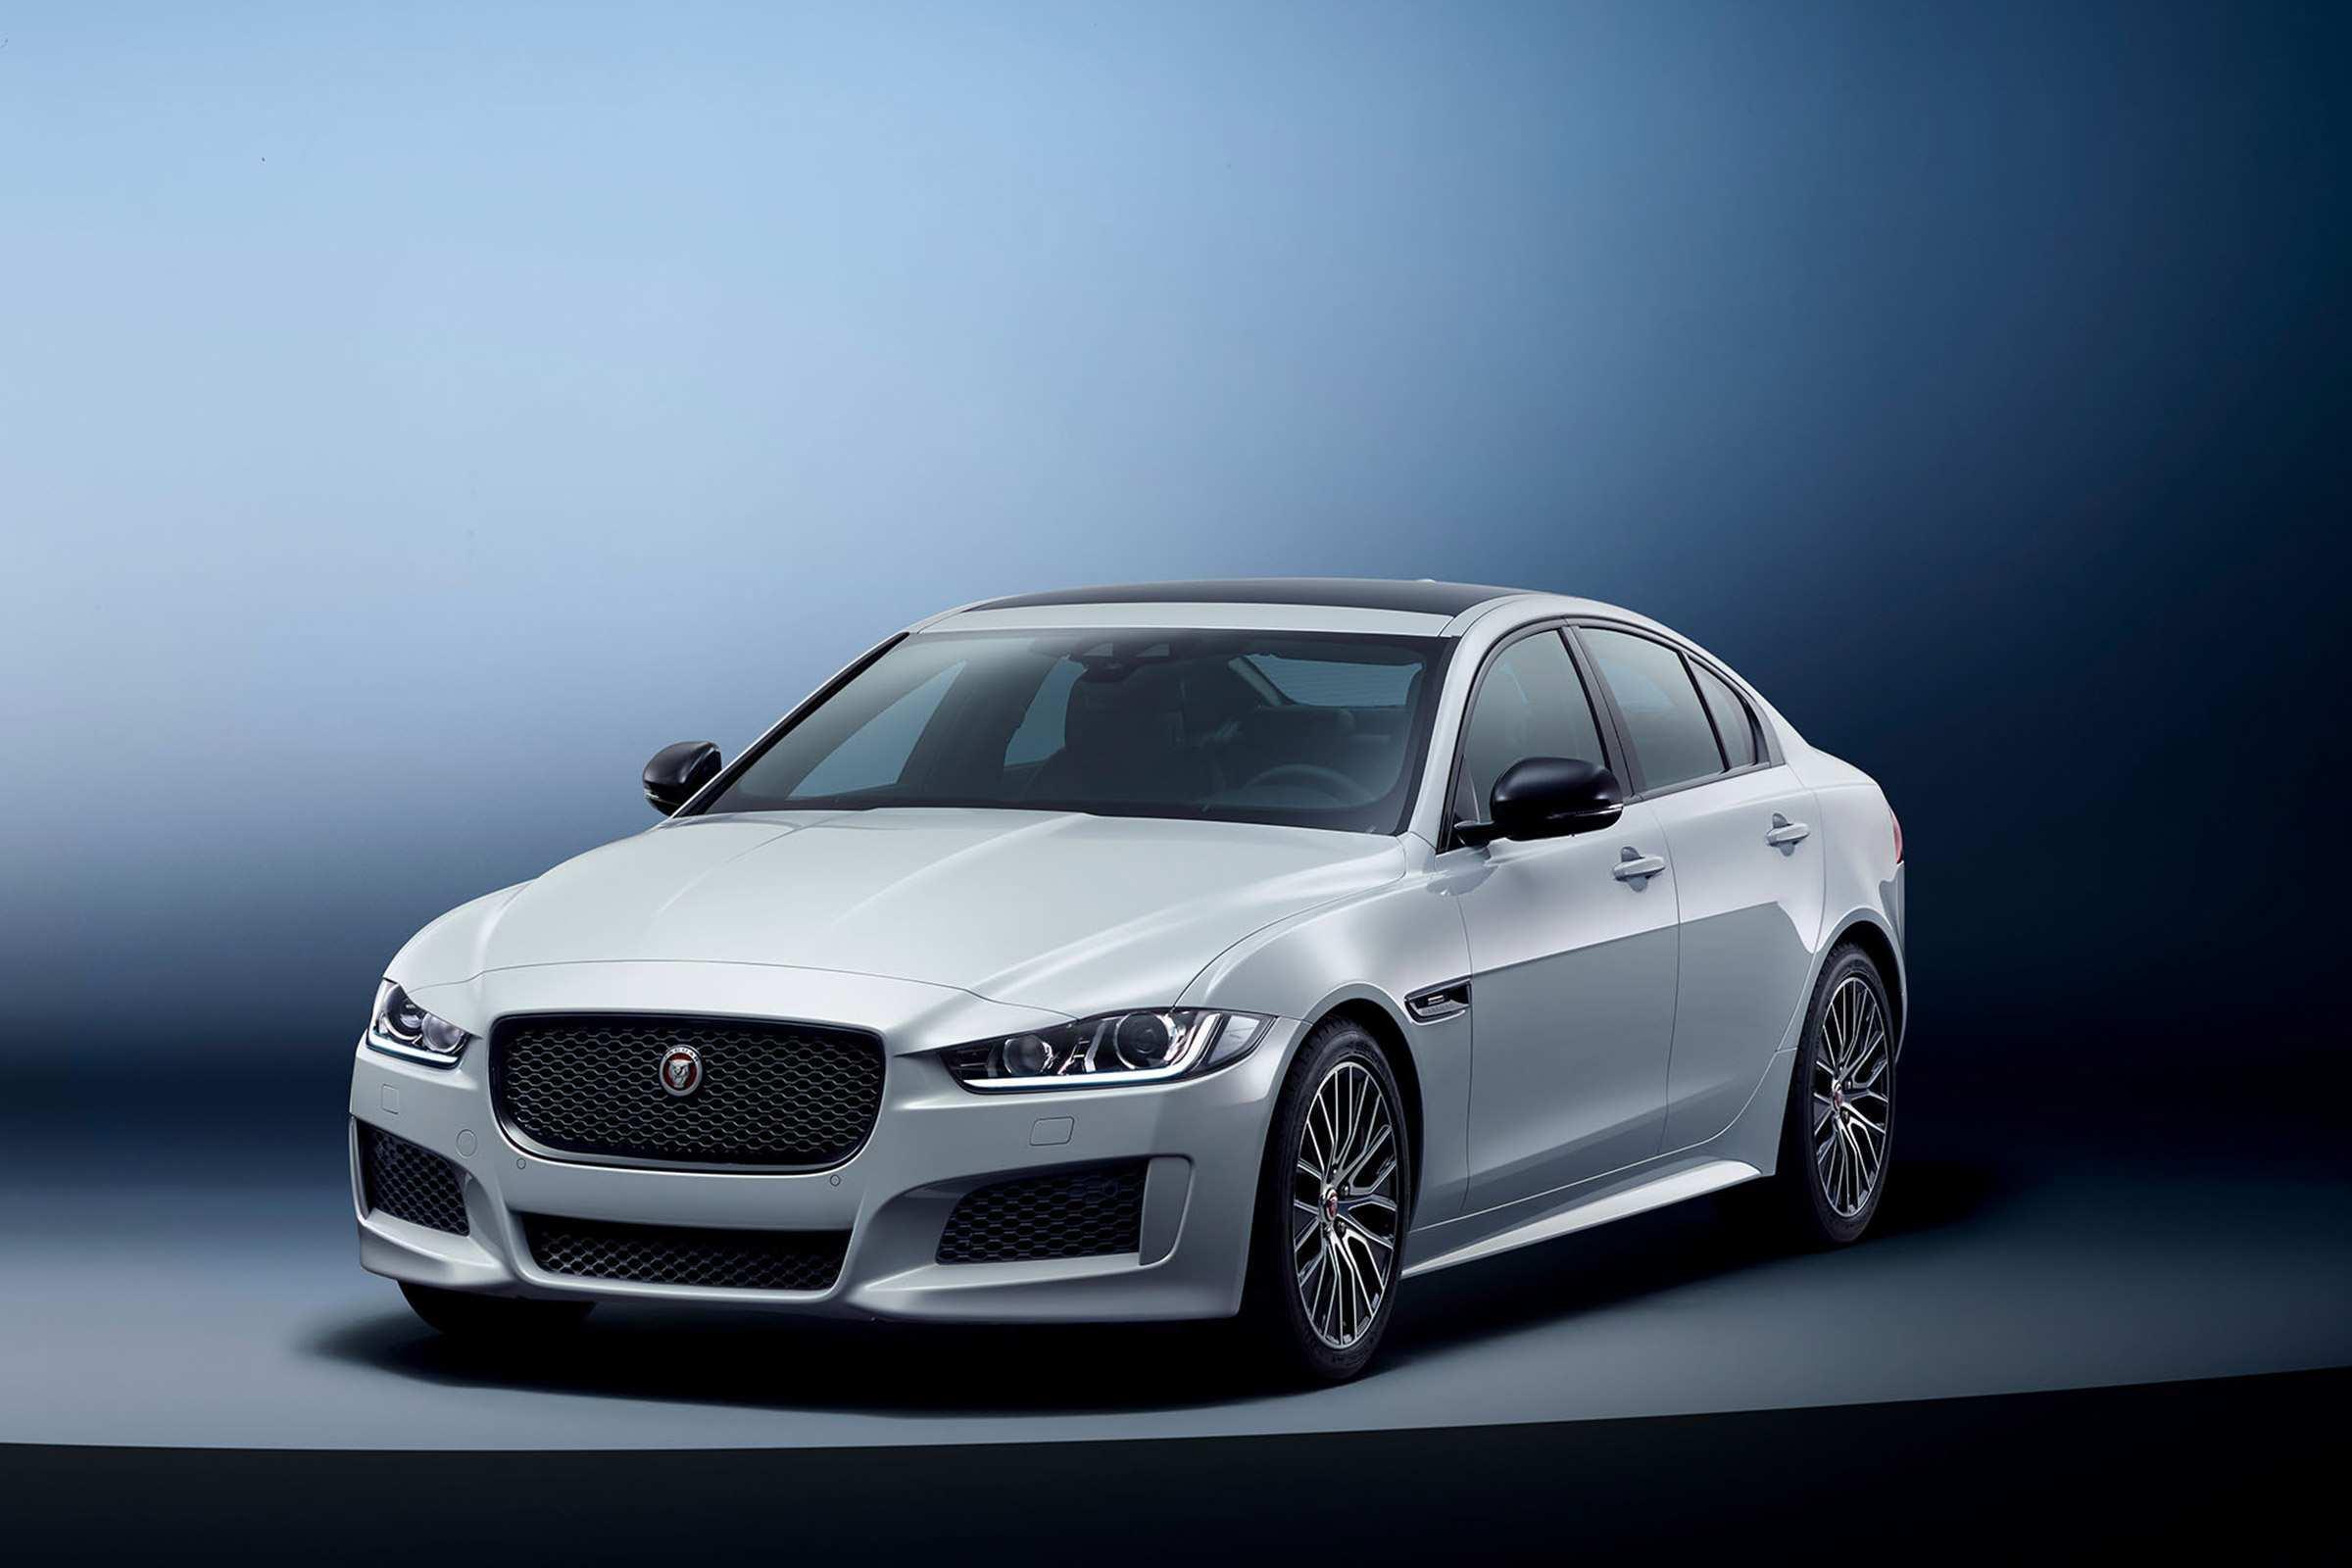 28 New 2019 Jaguar Xe Landmark Research New with 2019 Jaguar Xe Landmark